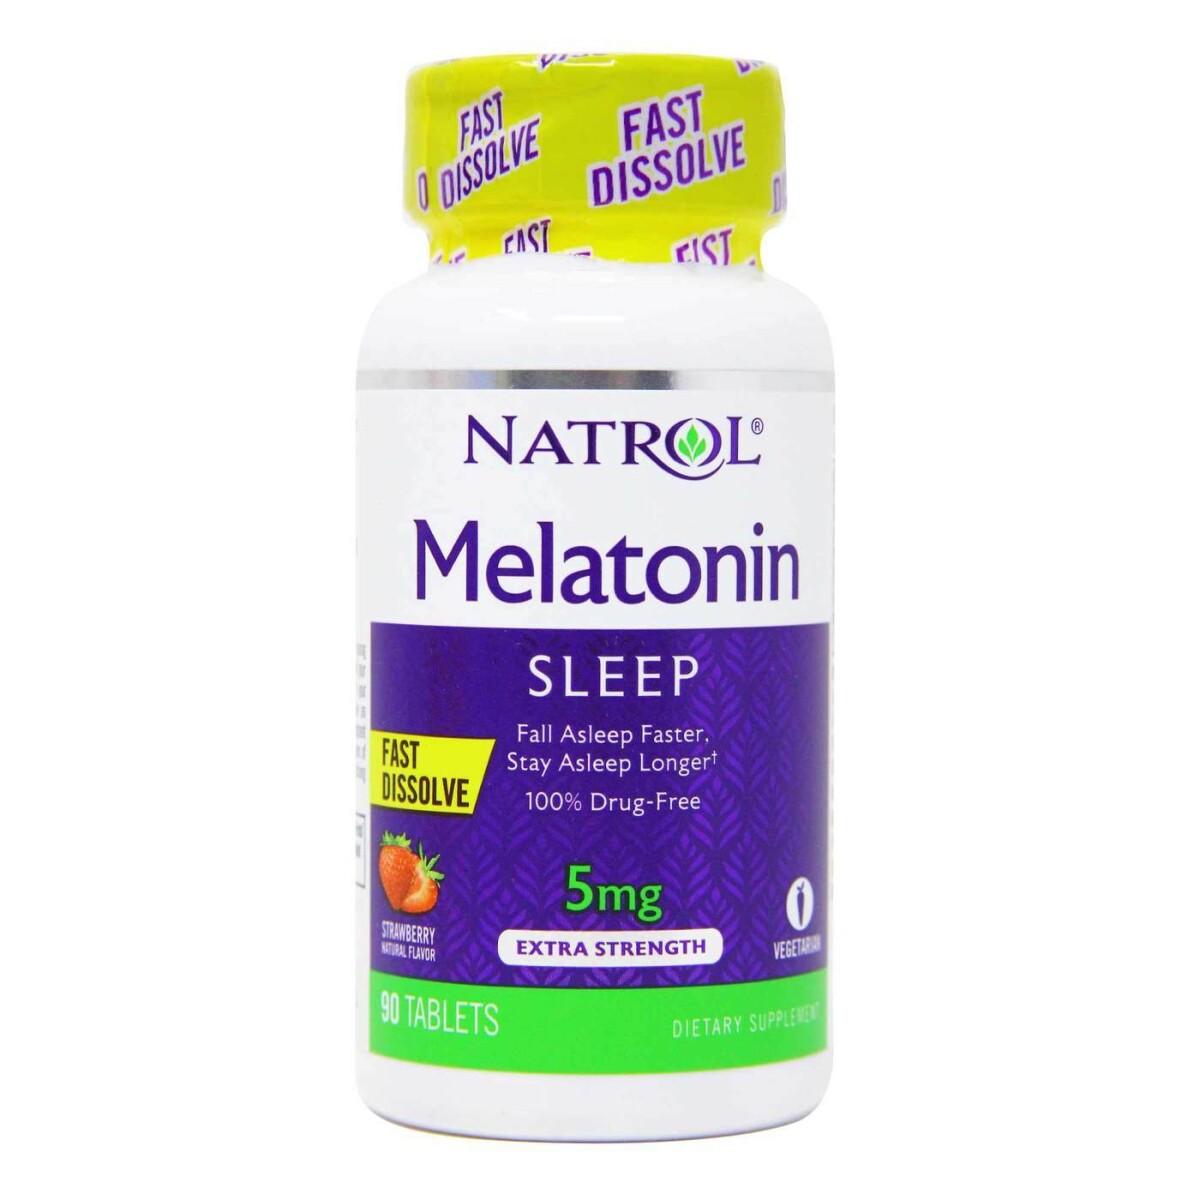 Foto 1 - Melatonina Natrol 5mg Fast Dissolve - 90 Tabletes